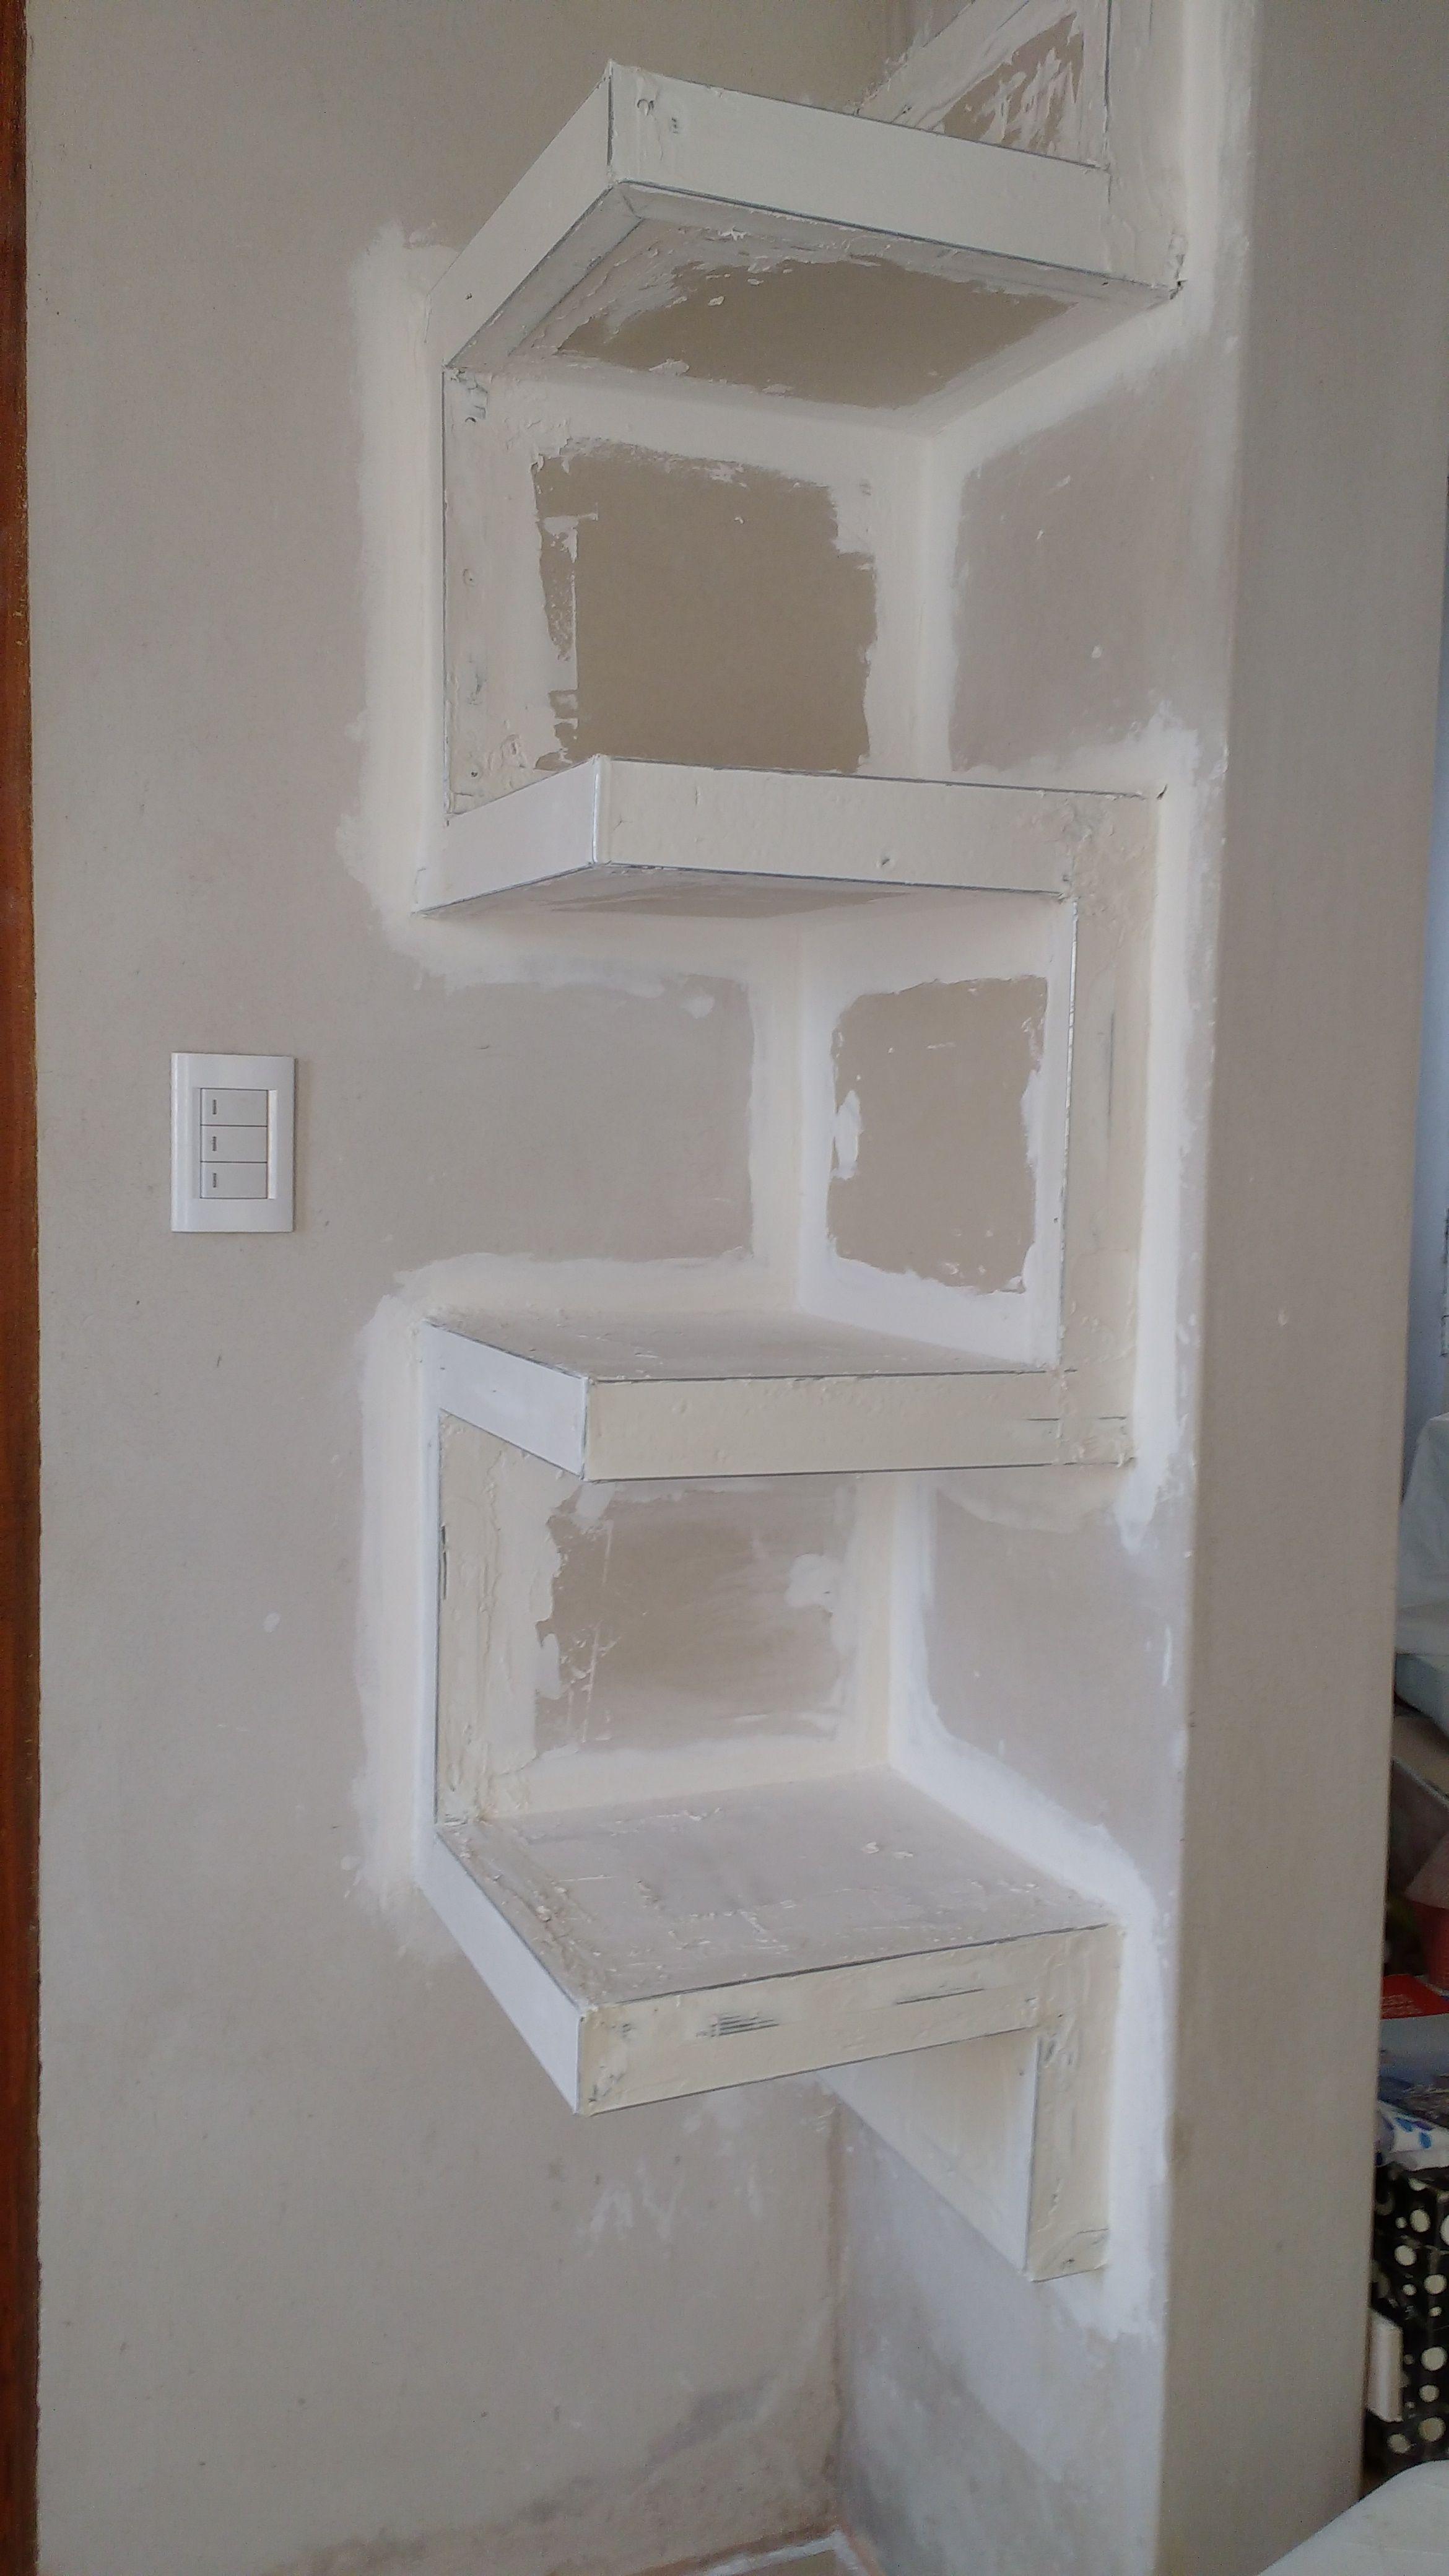 Mueble de durlock mueble repisa de durlock pinterest - Esquineros para paredes ...